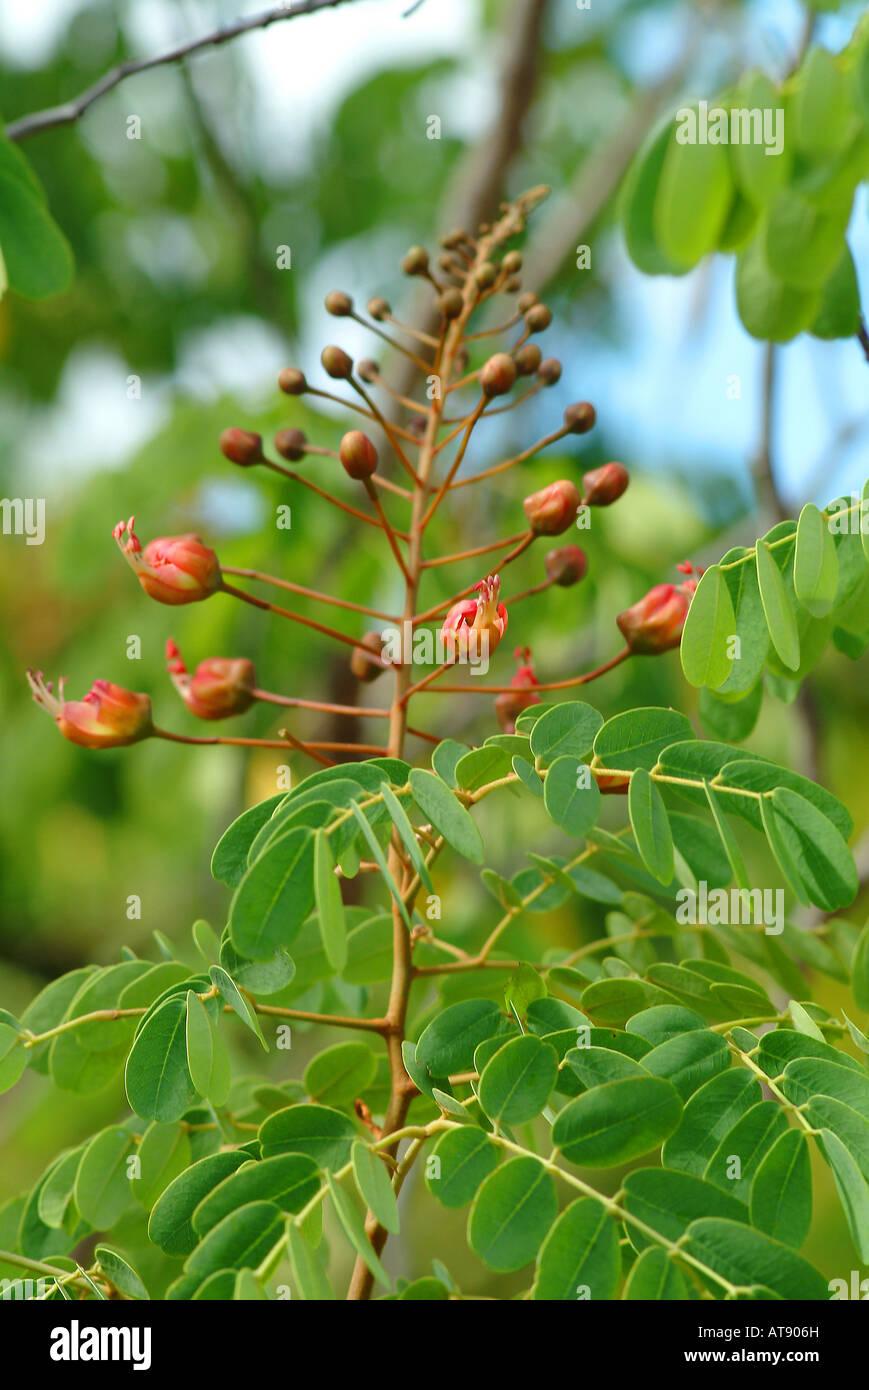 Endemische und gefährdete Pflanzen, Uhiuhi (Fabaceae: †Caesalpinia Kavaiensis) am Stadtgarten in Pearl City, Oahu Stockfoto